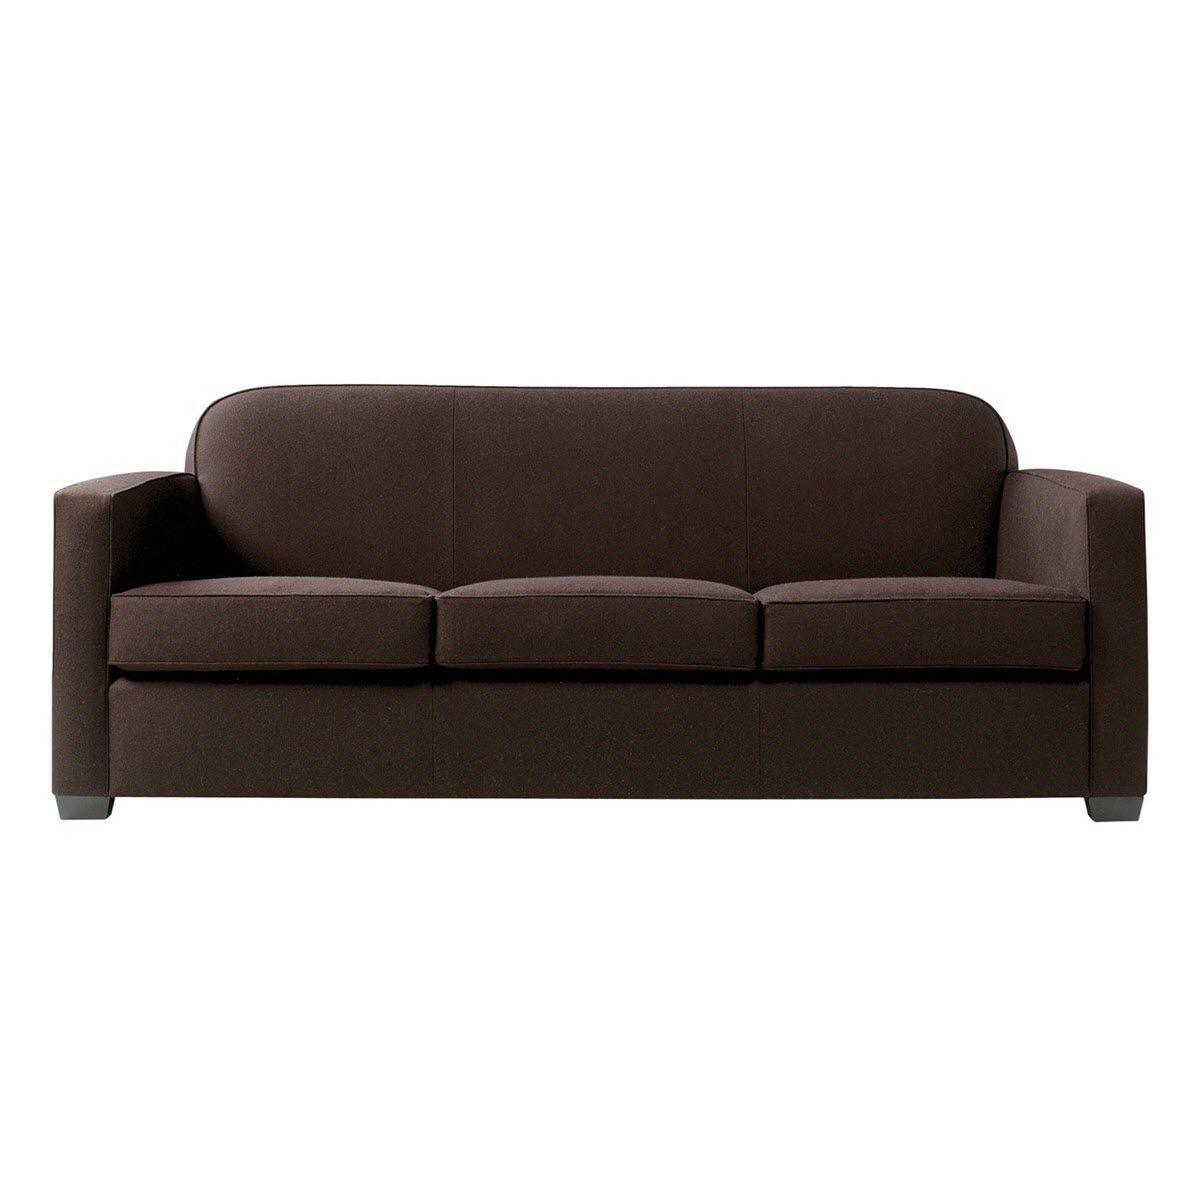 Contemporary Sofa Fabric 3 Seater Brown Jaguar